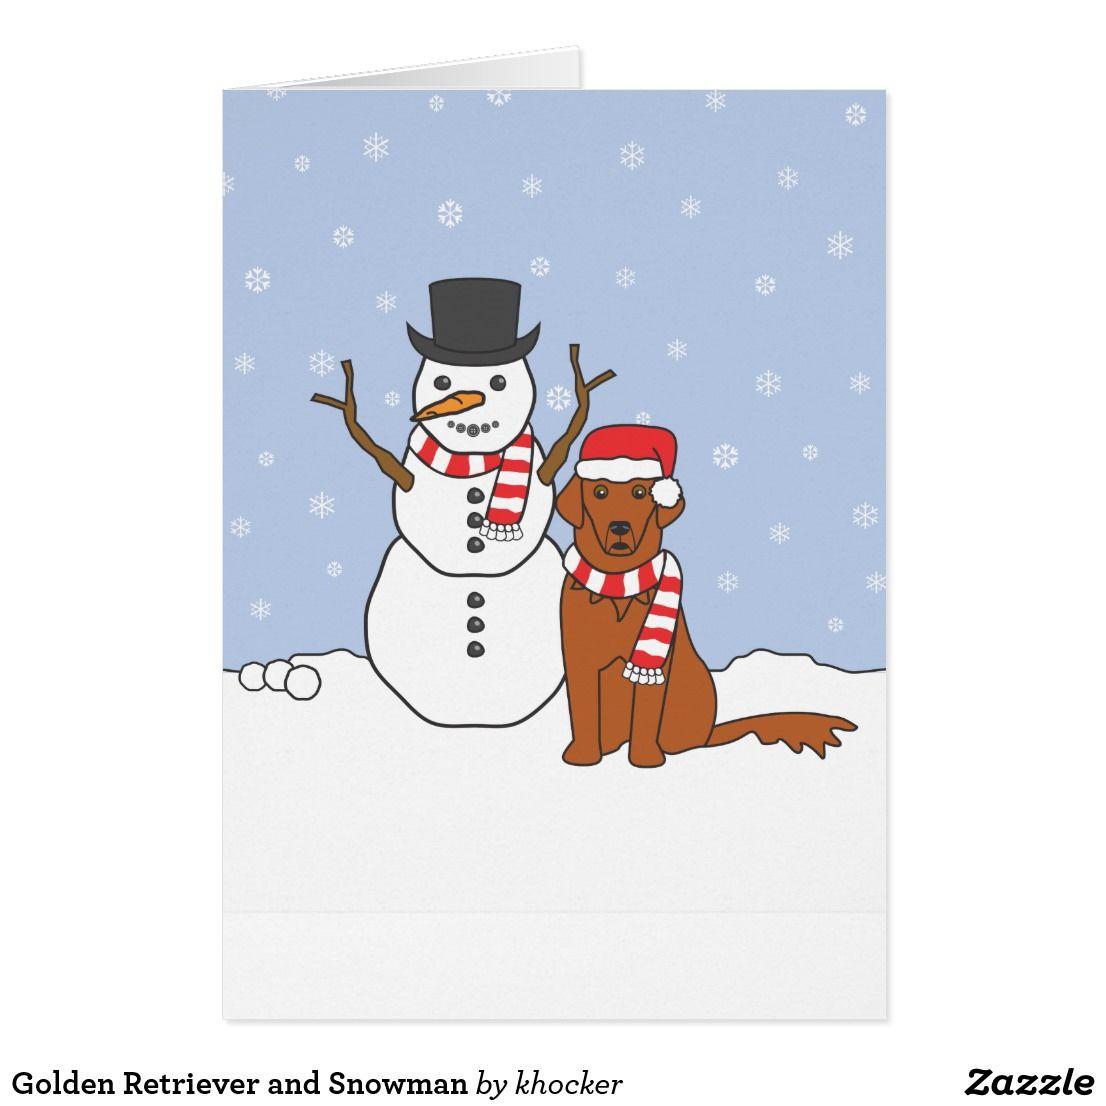 Golden retriever and snowman holiday card